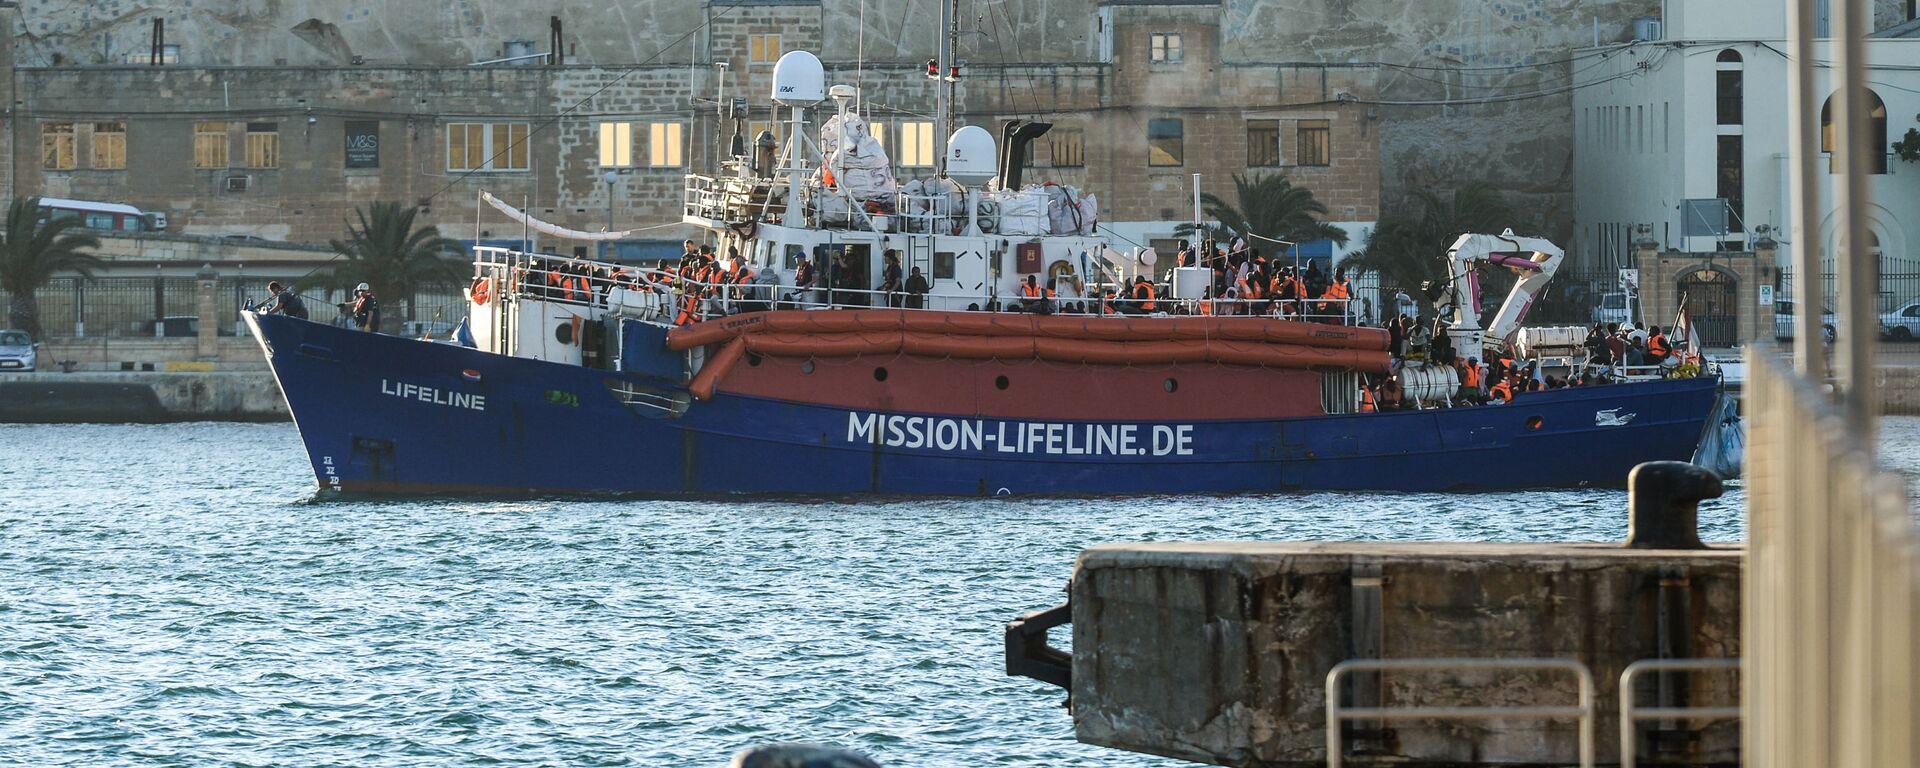 Una nave dell'ong Lifeline - Sputnik Italia, 1920, 27.09.2019